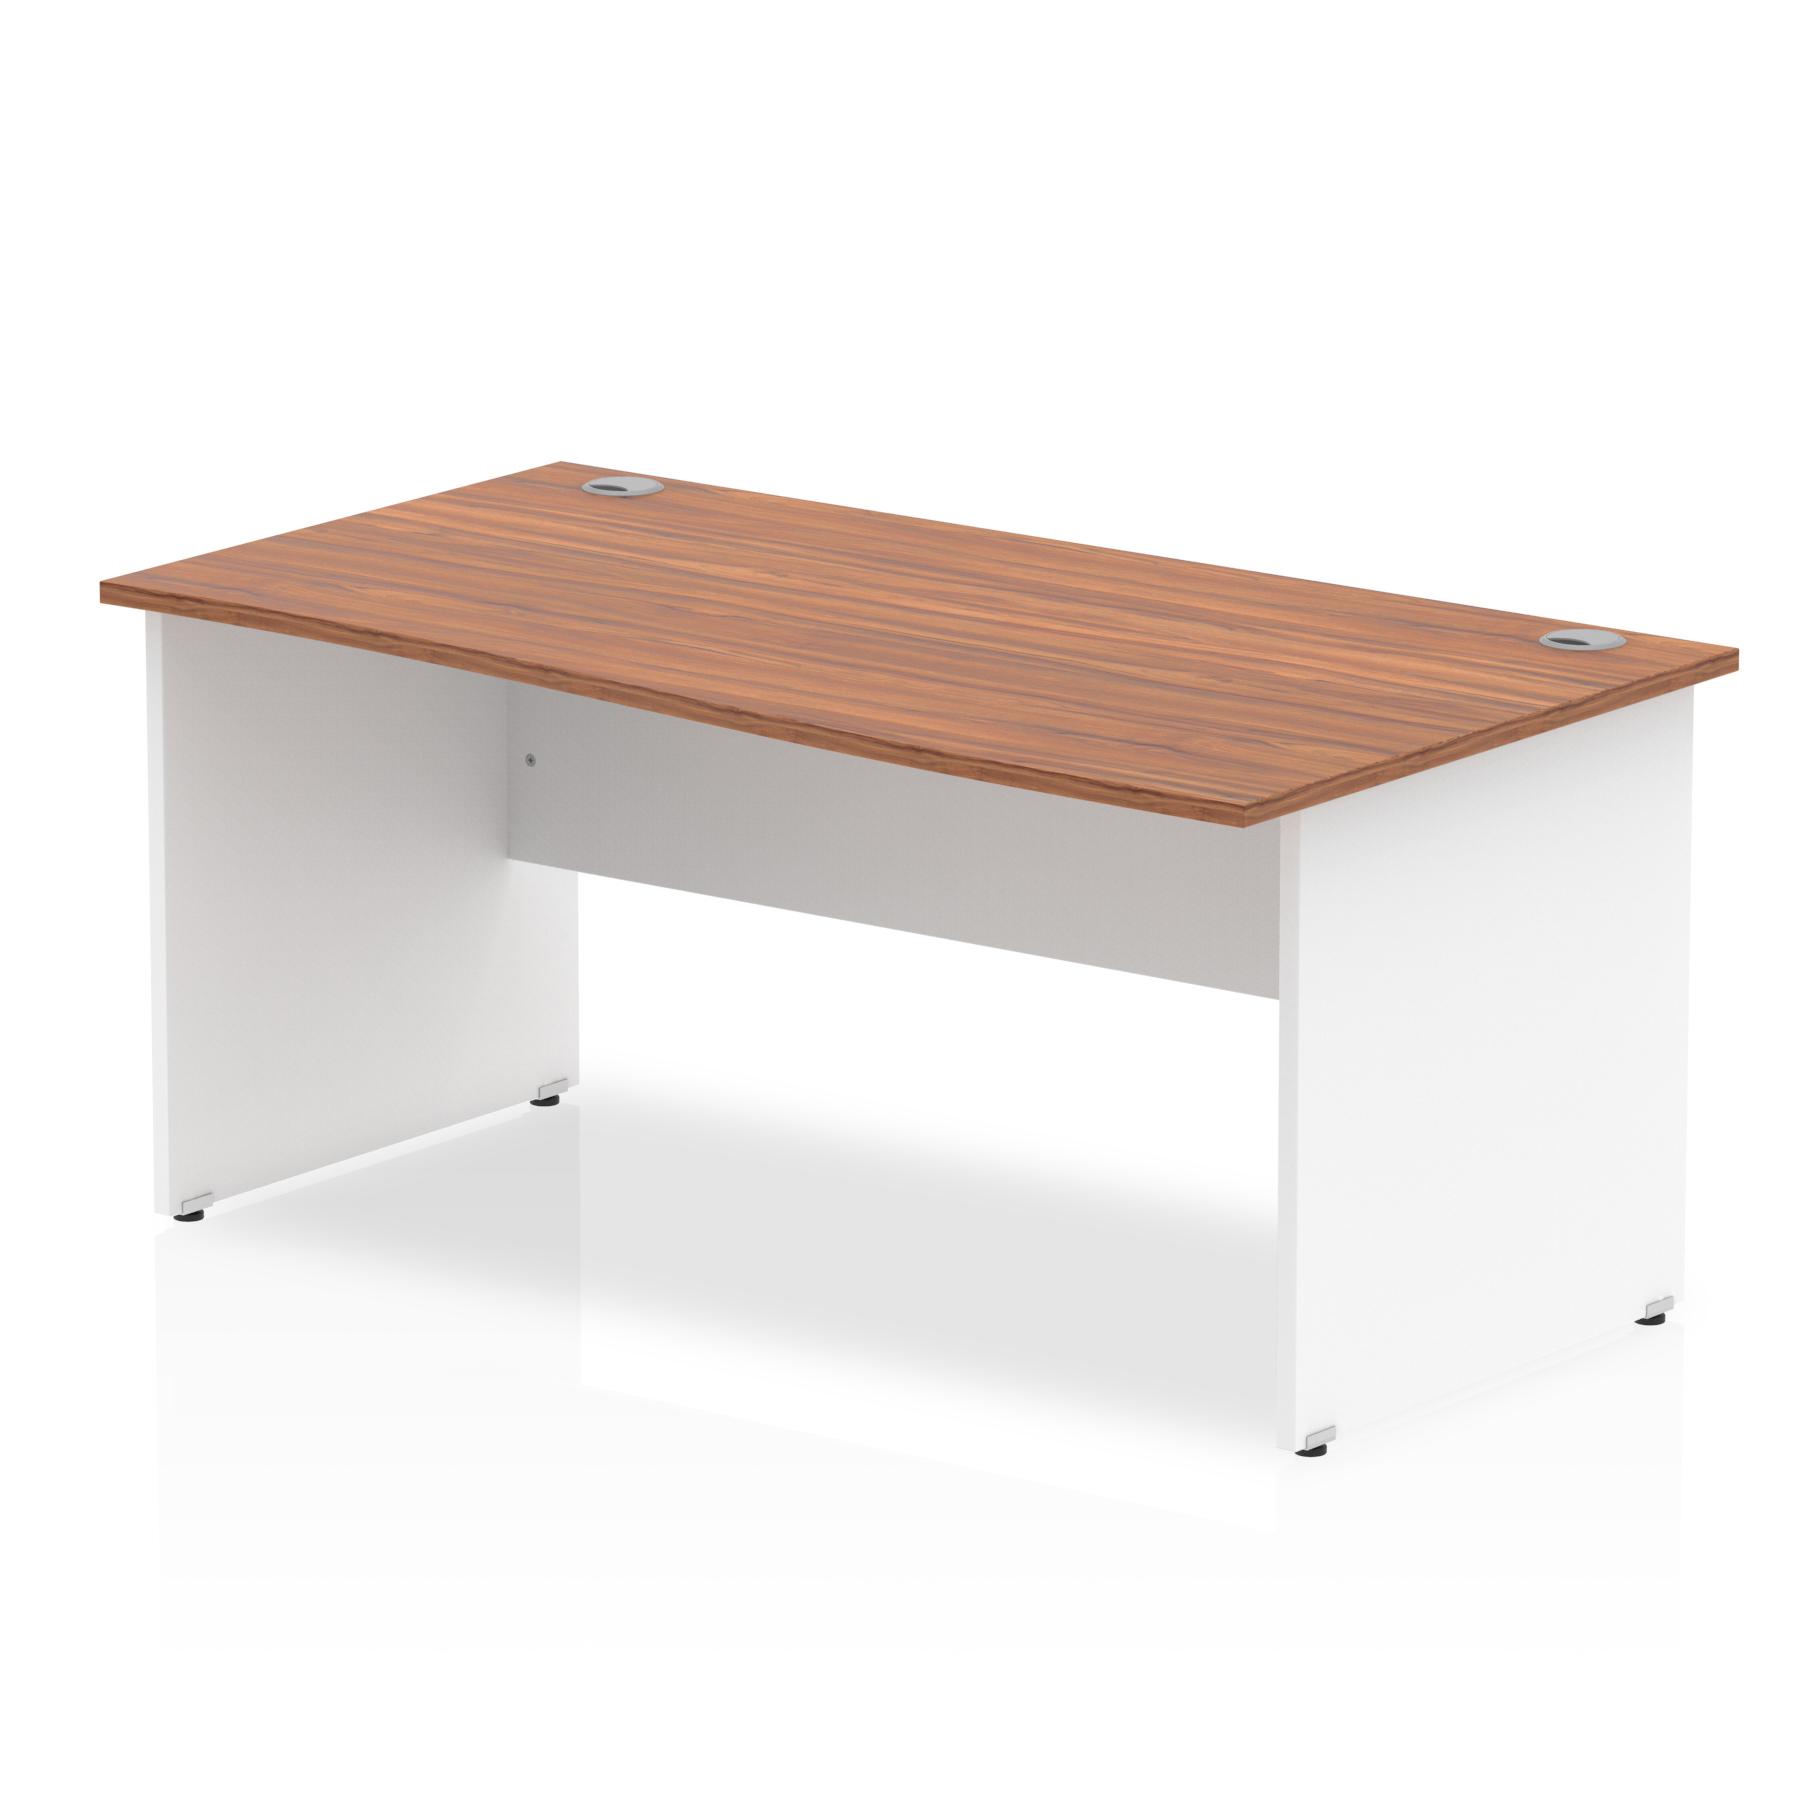 Trexus Desk Wave Right Hand Panel End 1600x800mm Walnut Top White Panels Ref TT000067